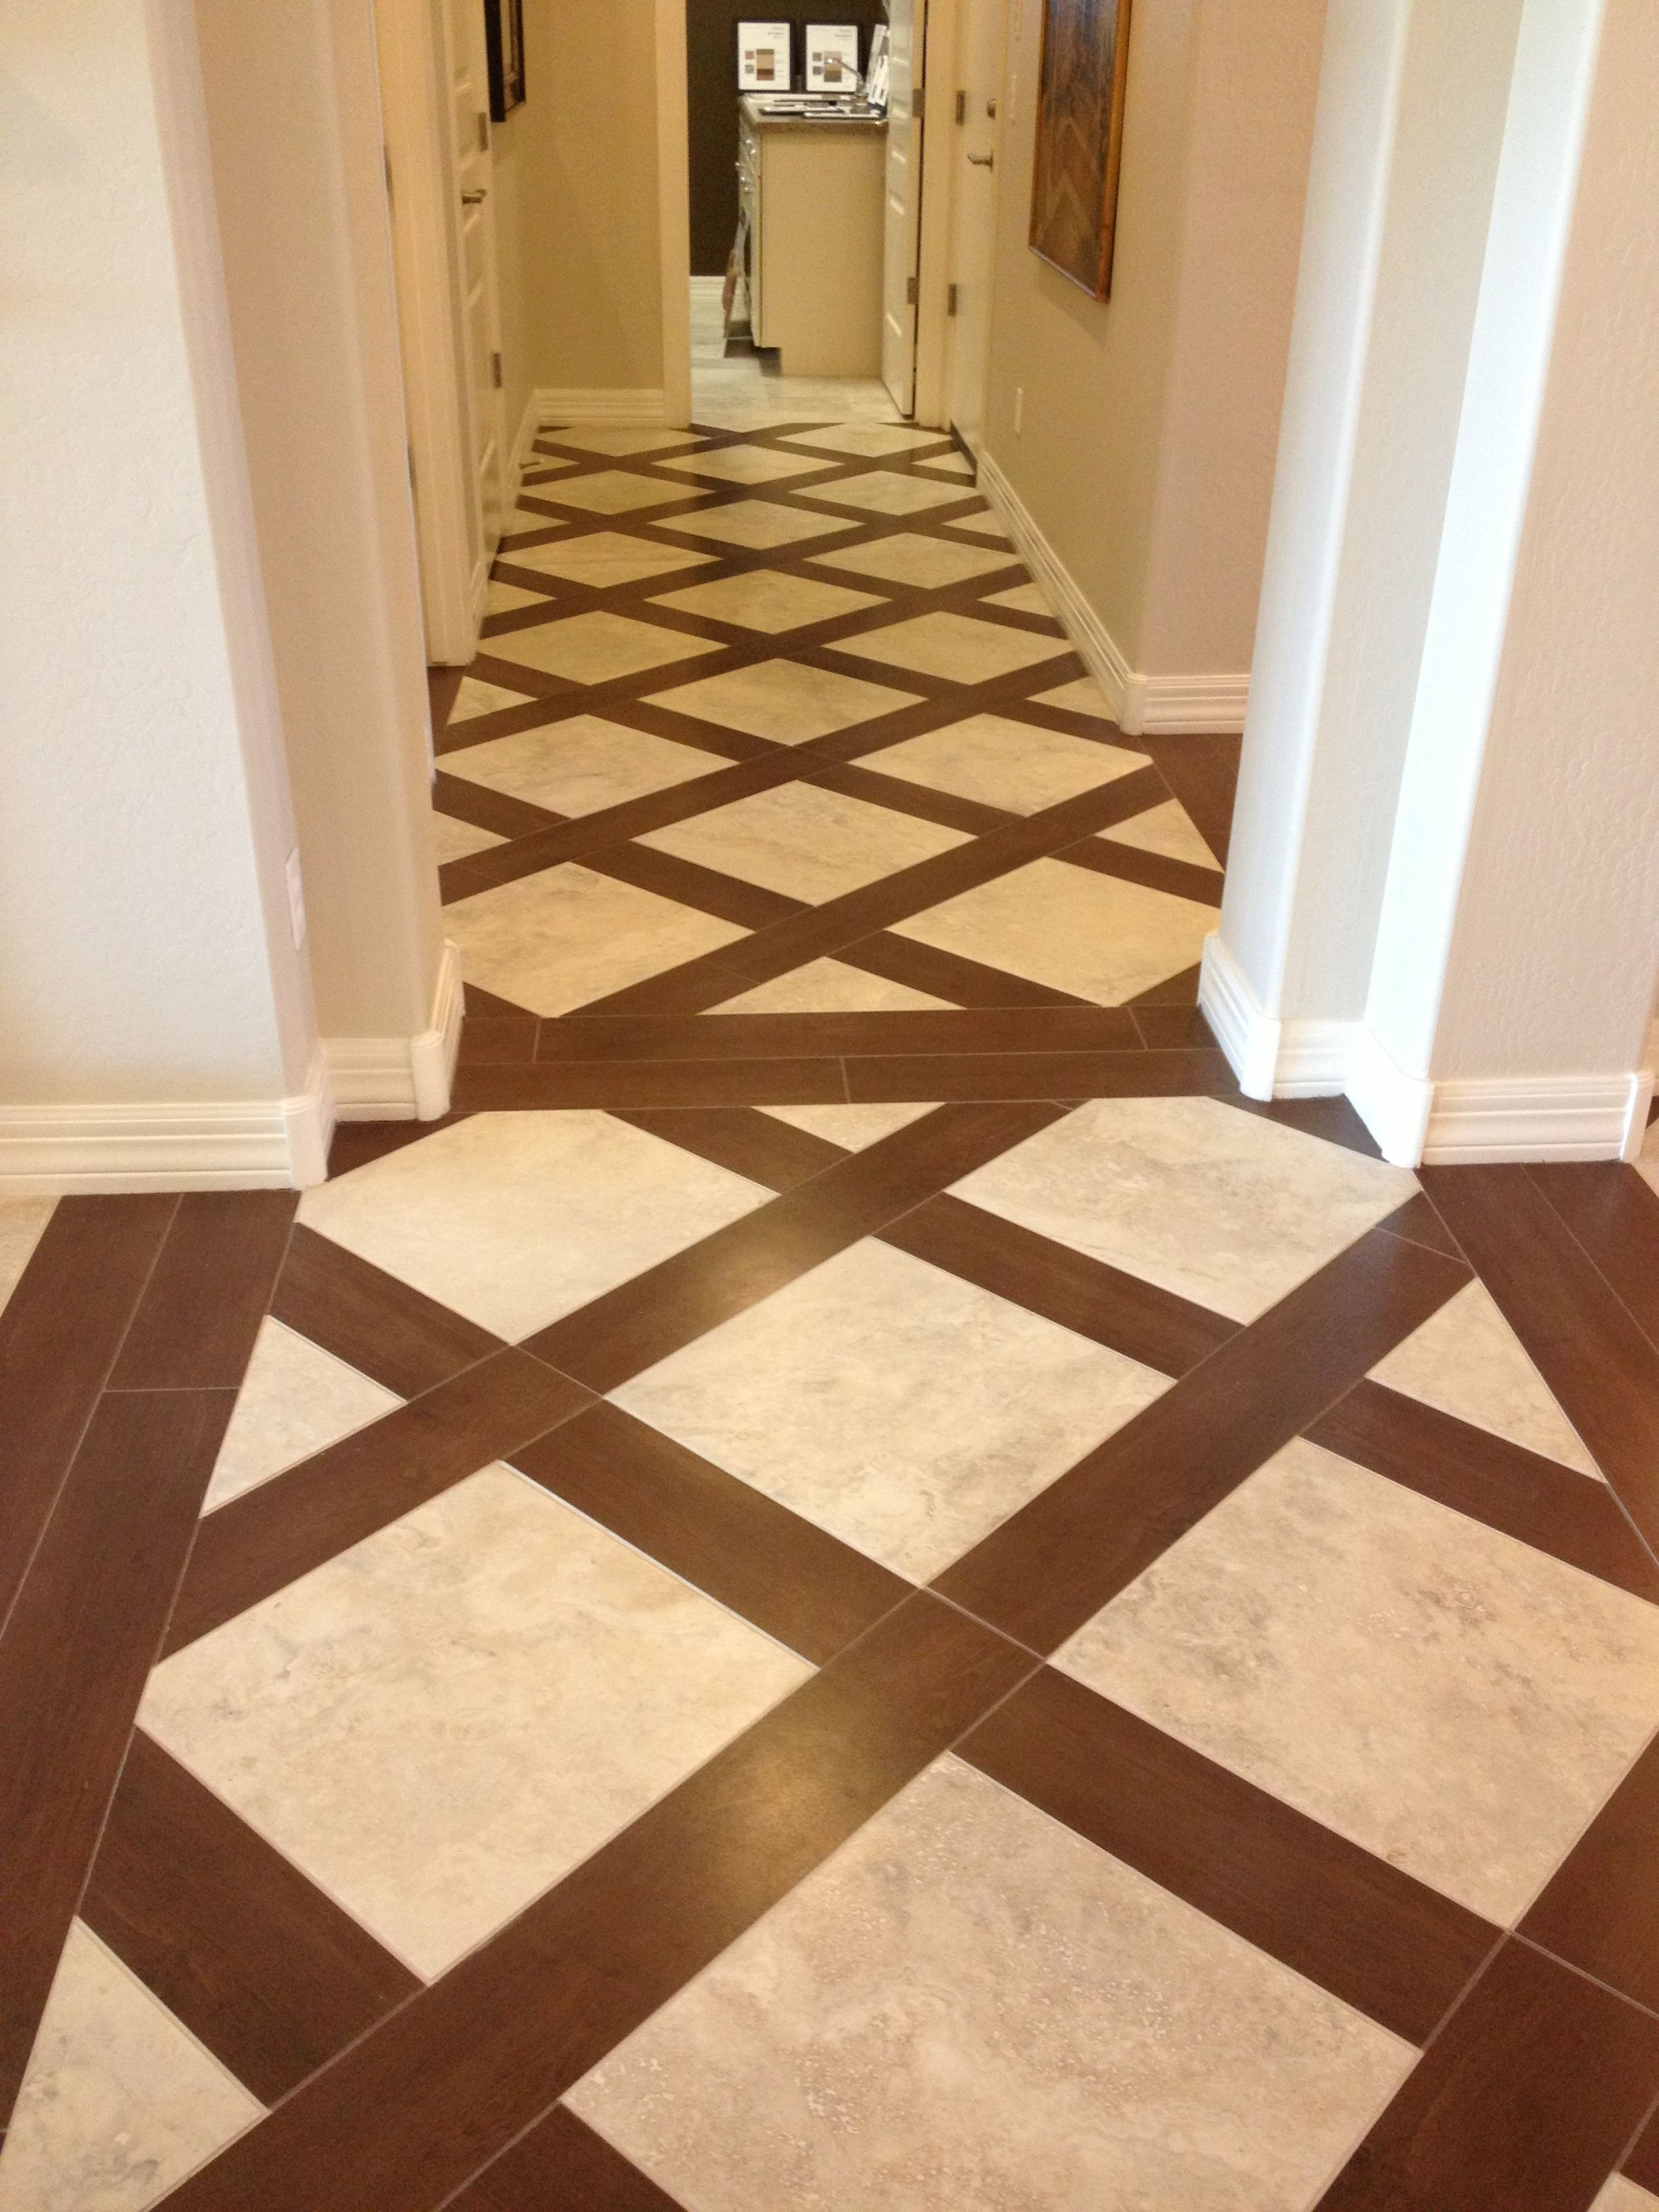 Ceramic Tile And Wood Floor